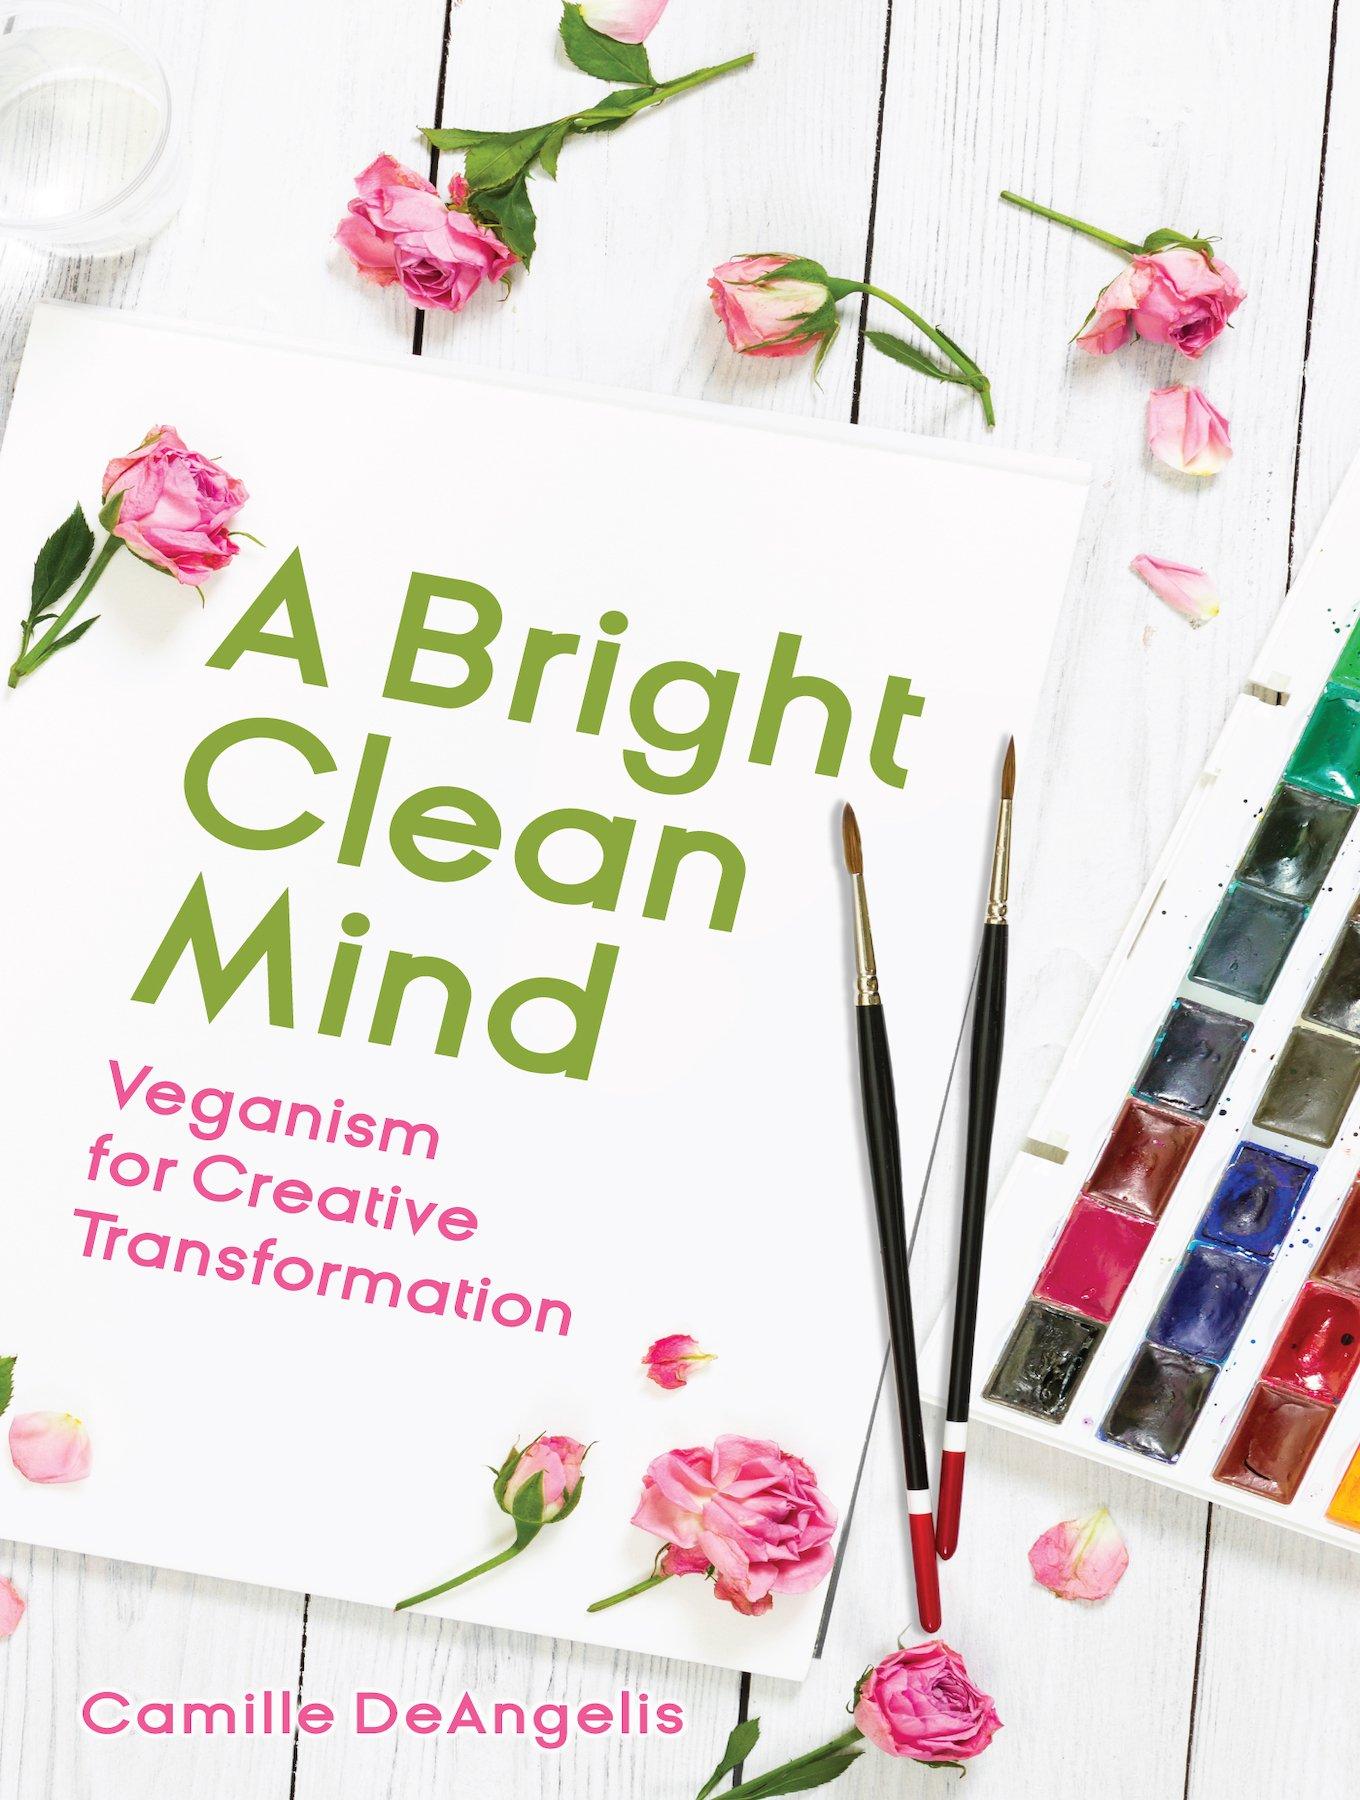 Bright clean mind by Camille DeAngelis